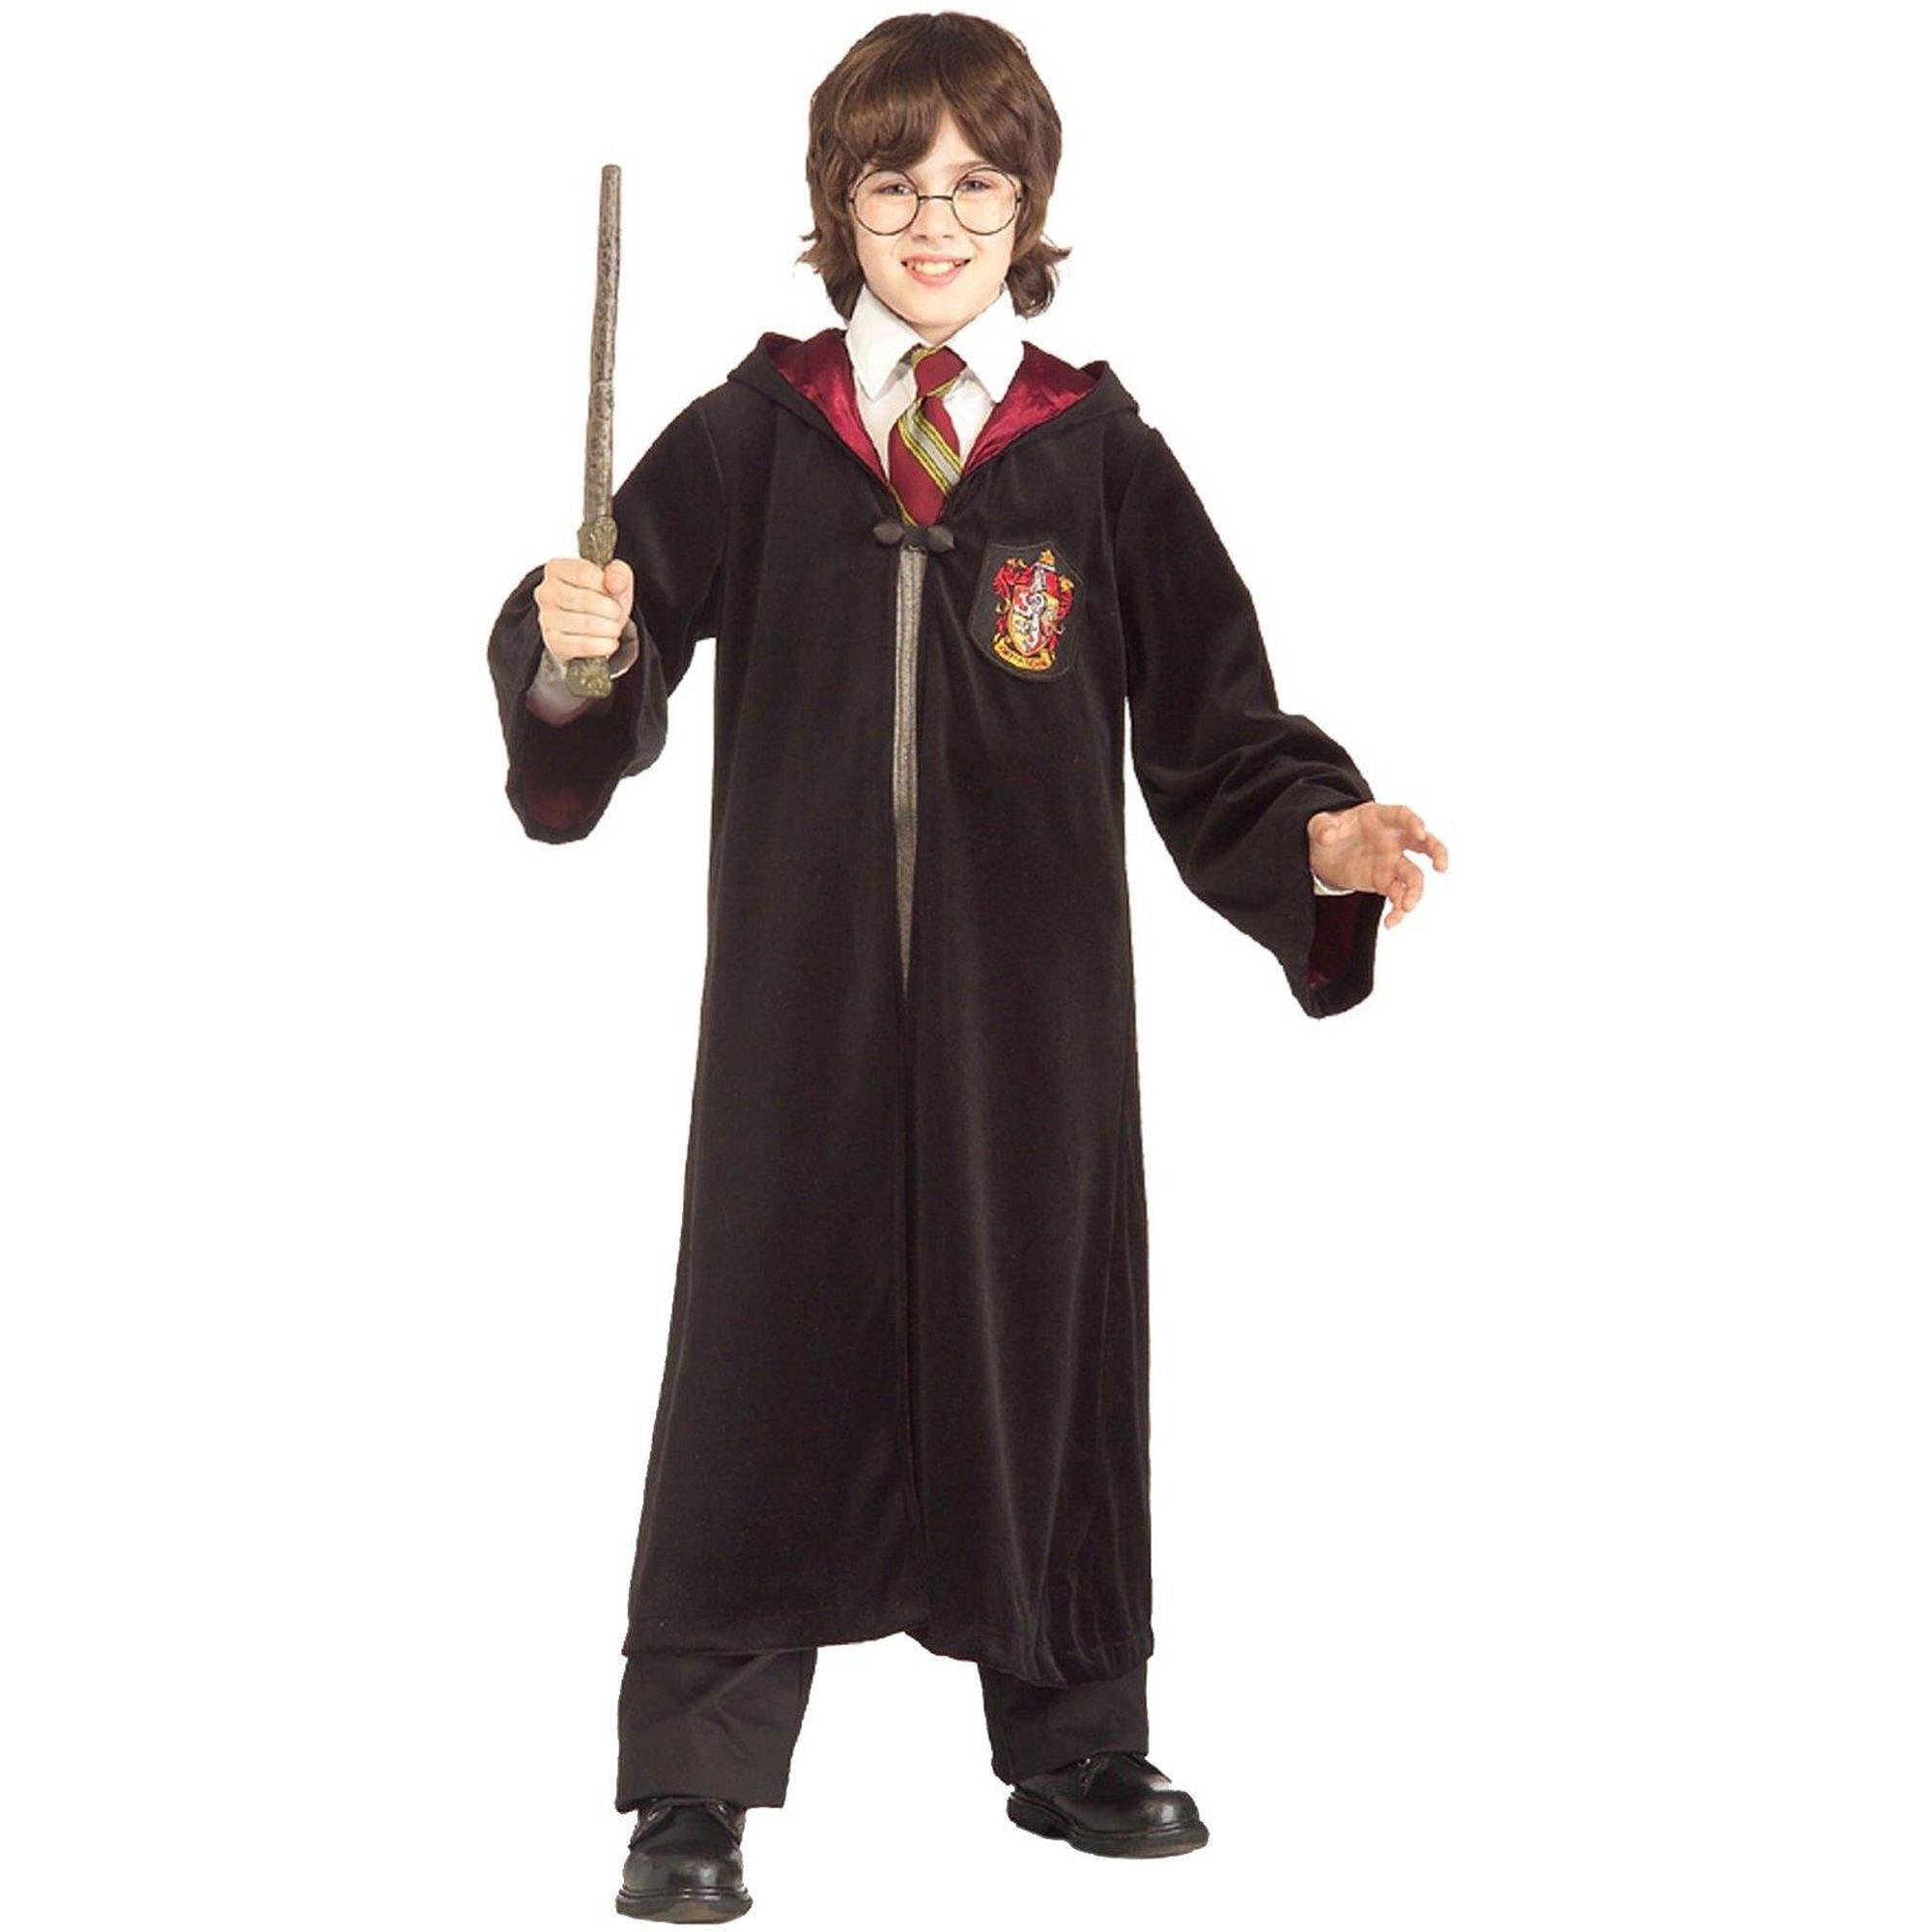 Harry Potter Premium Gryffindor Robe Child Halloween Costume, Small (4-6)